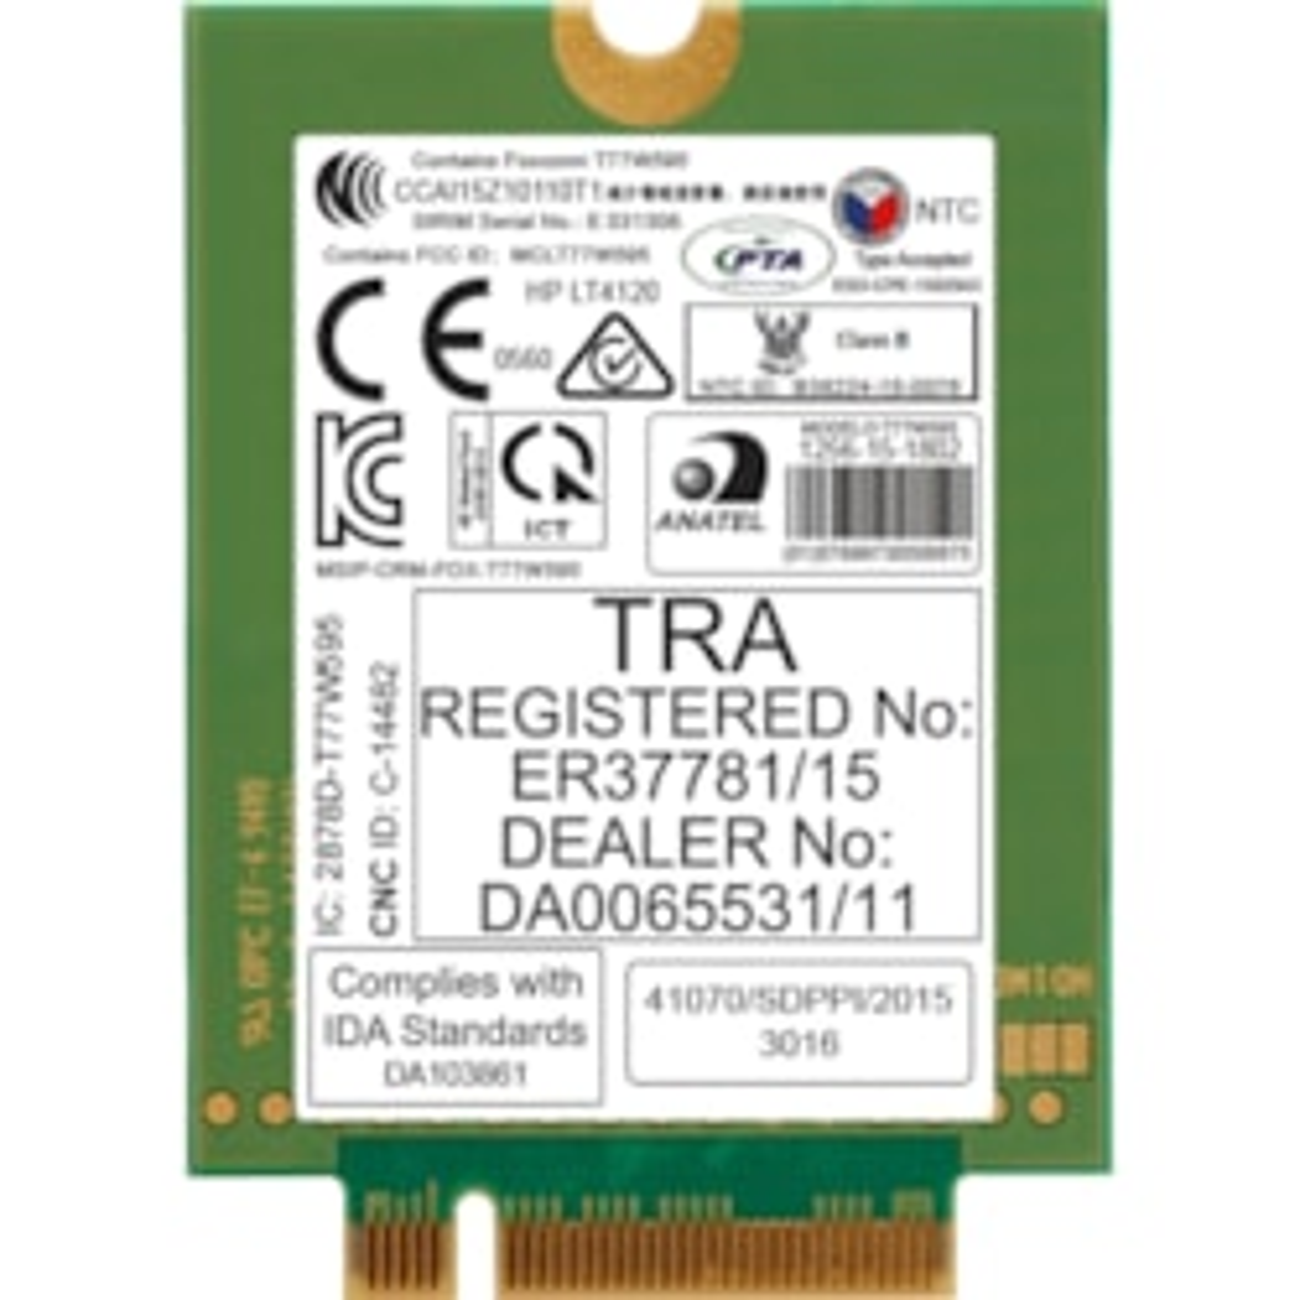 HP LT4120 Radio Modem